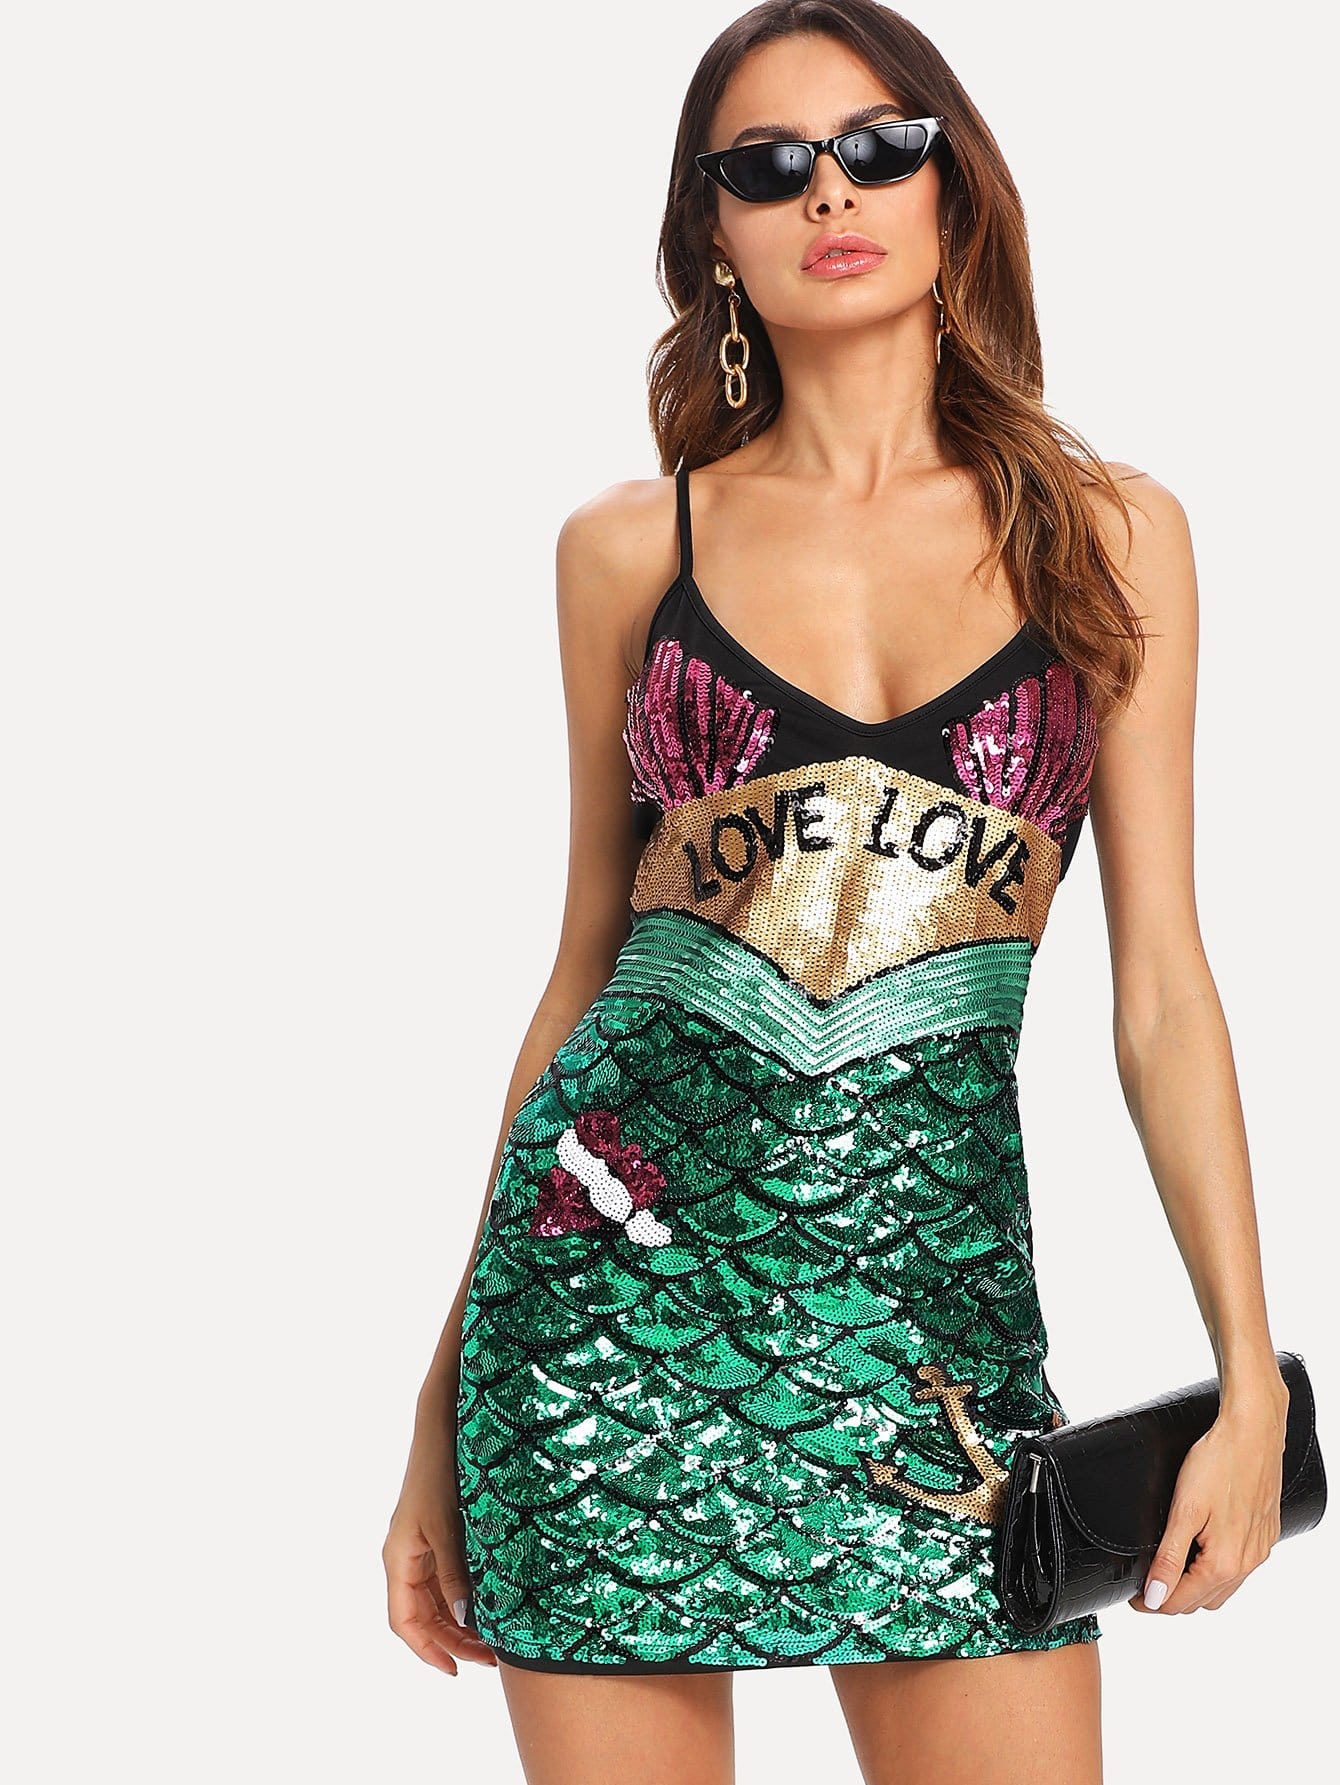 Sequin Color Block Cami Dress striped print color block cami dress